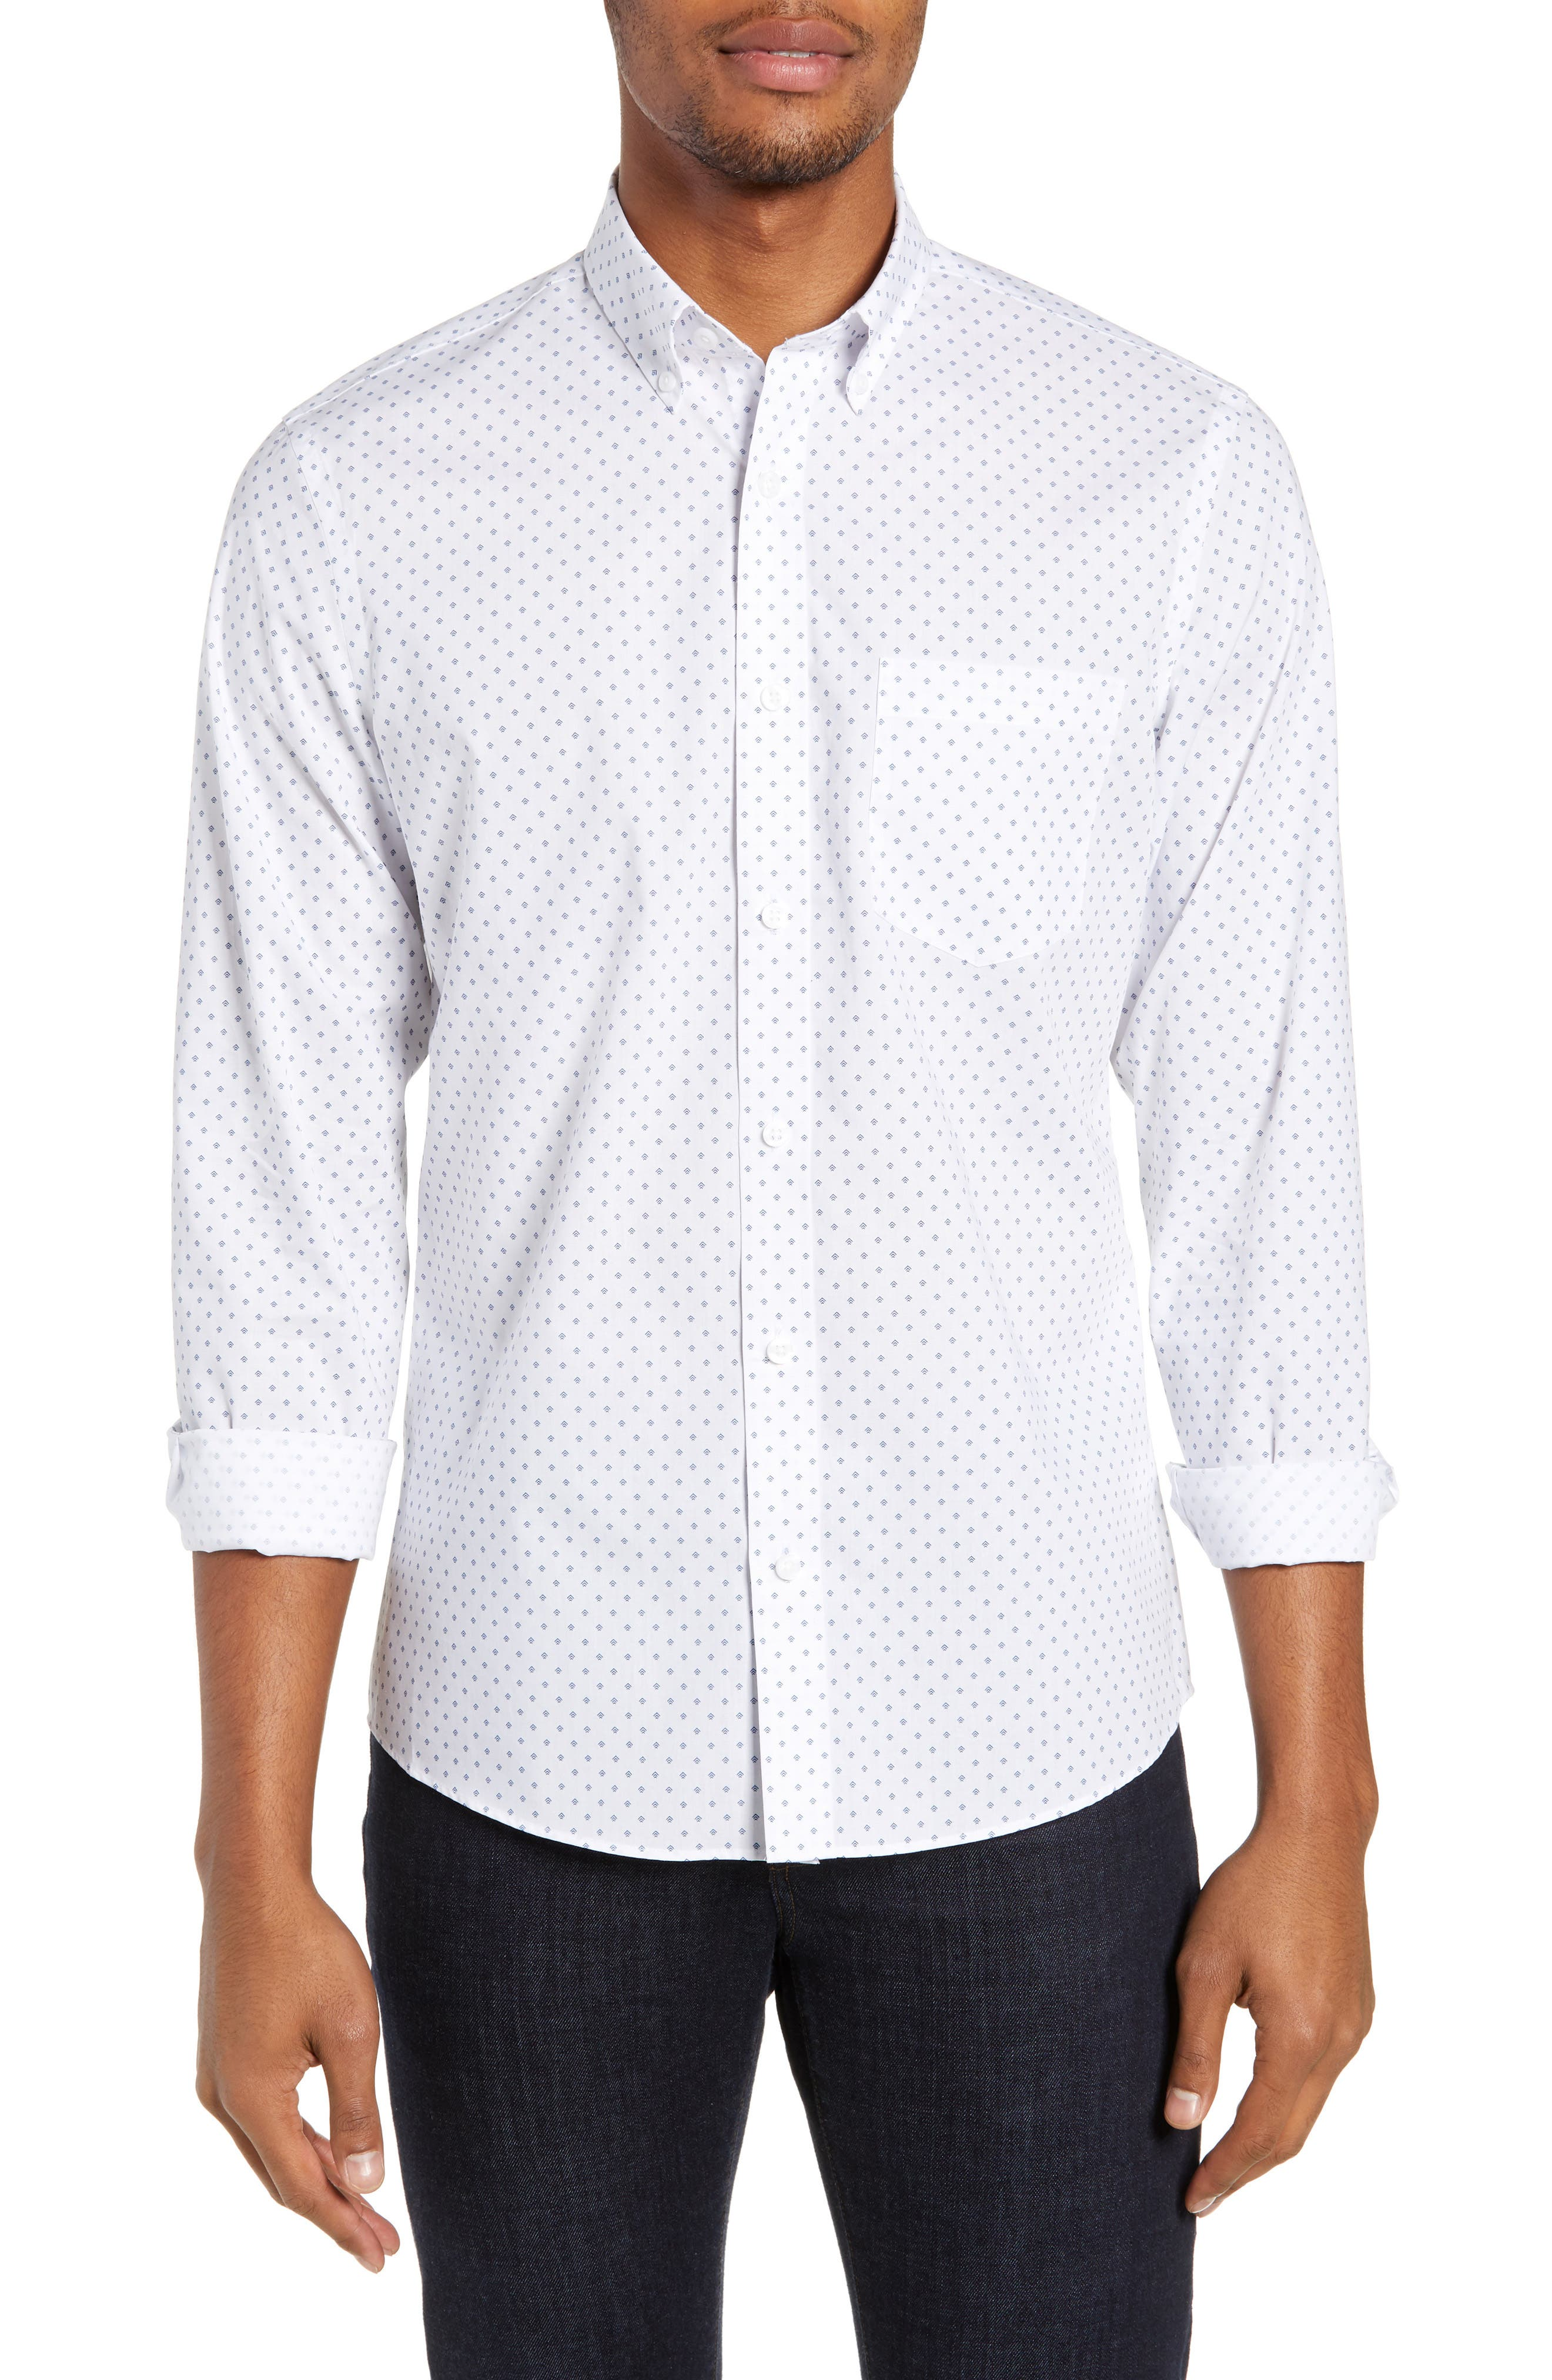 NORDSTROM MEN'S SHOP Slim Fit Non-Iron Geo Print Sport Shirt, Main, color, 100